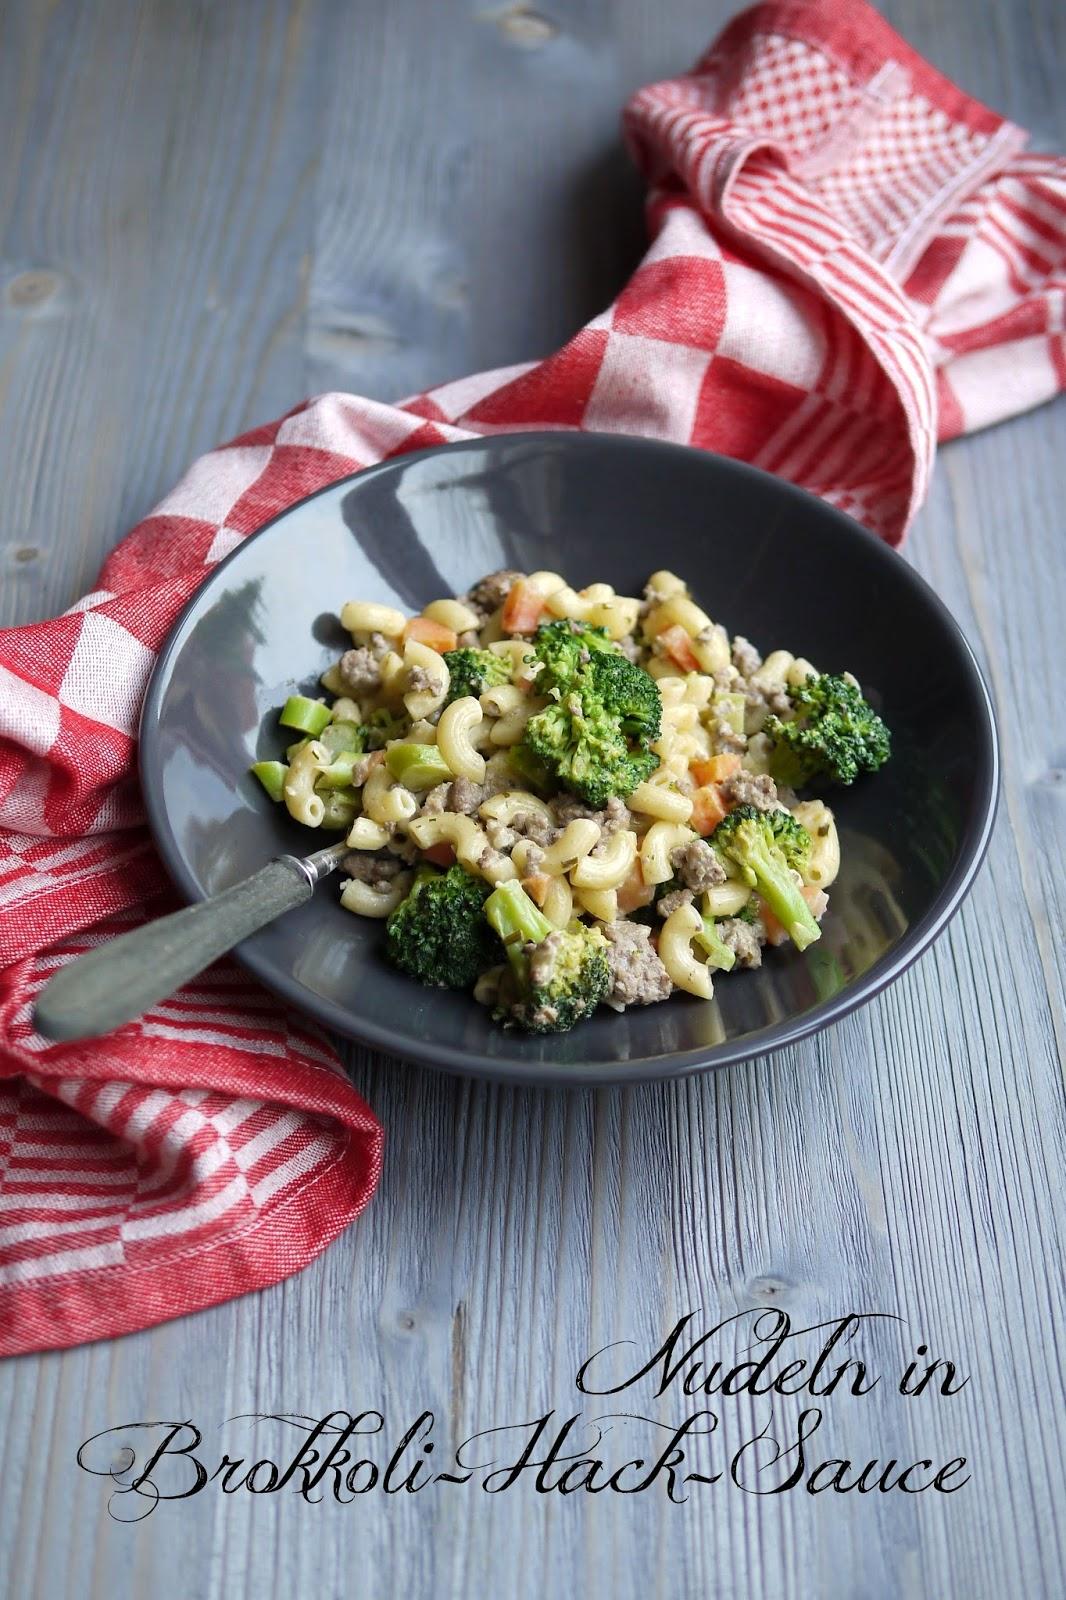 Nudeln mit Brokkoli-Hack-Sauce | Rezept | Kochen | Essen | Pasta